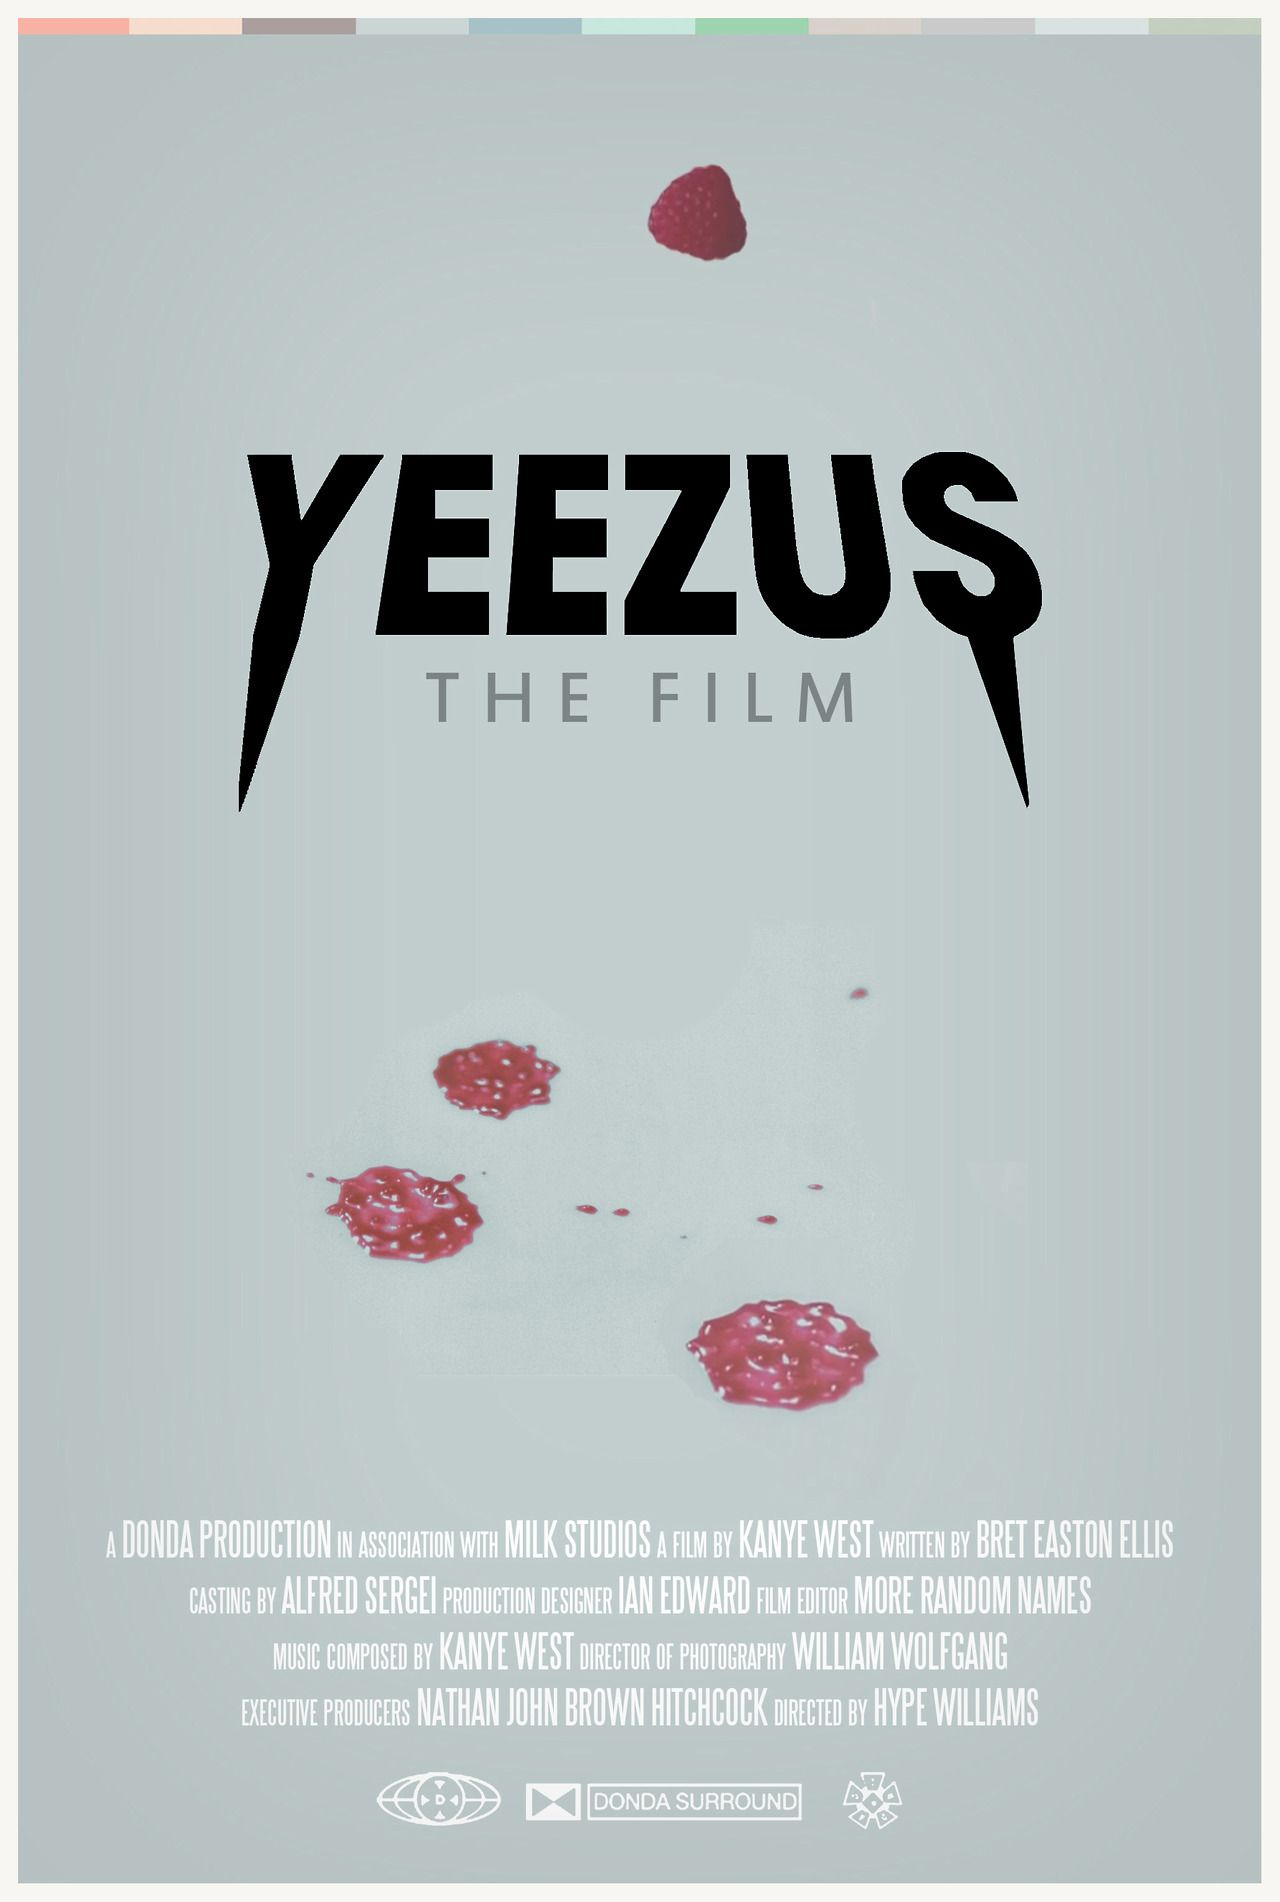 Pin By Rachel Fendel On For The Love Of Music Yeezus Heartbreak Songs Movie Posters